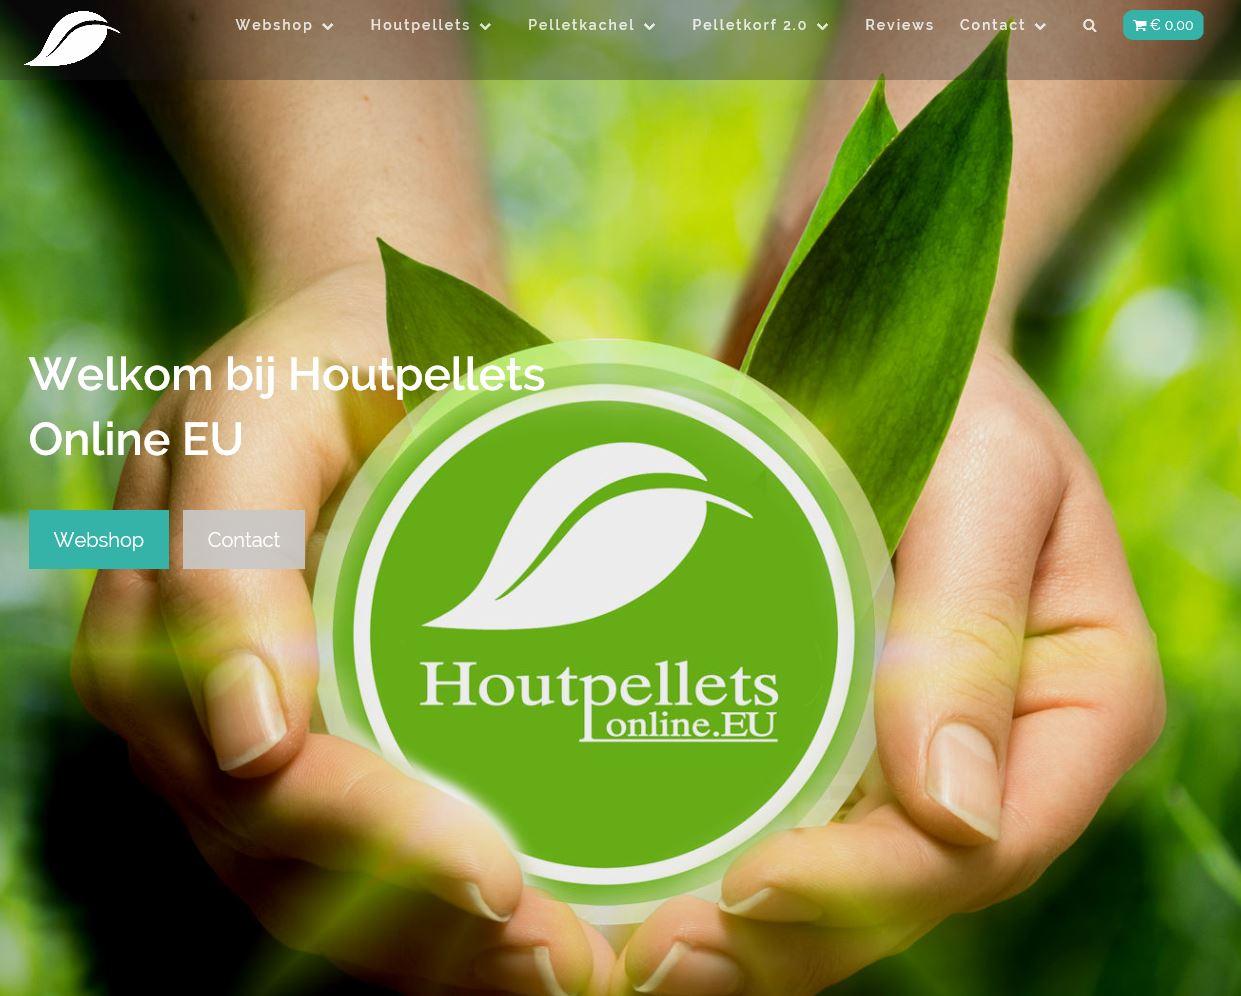 Houtpellets Online EU